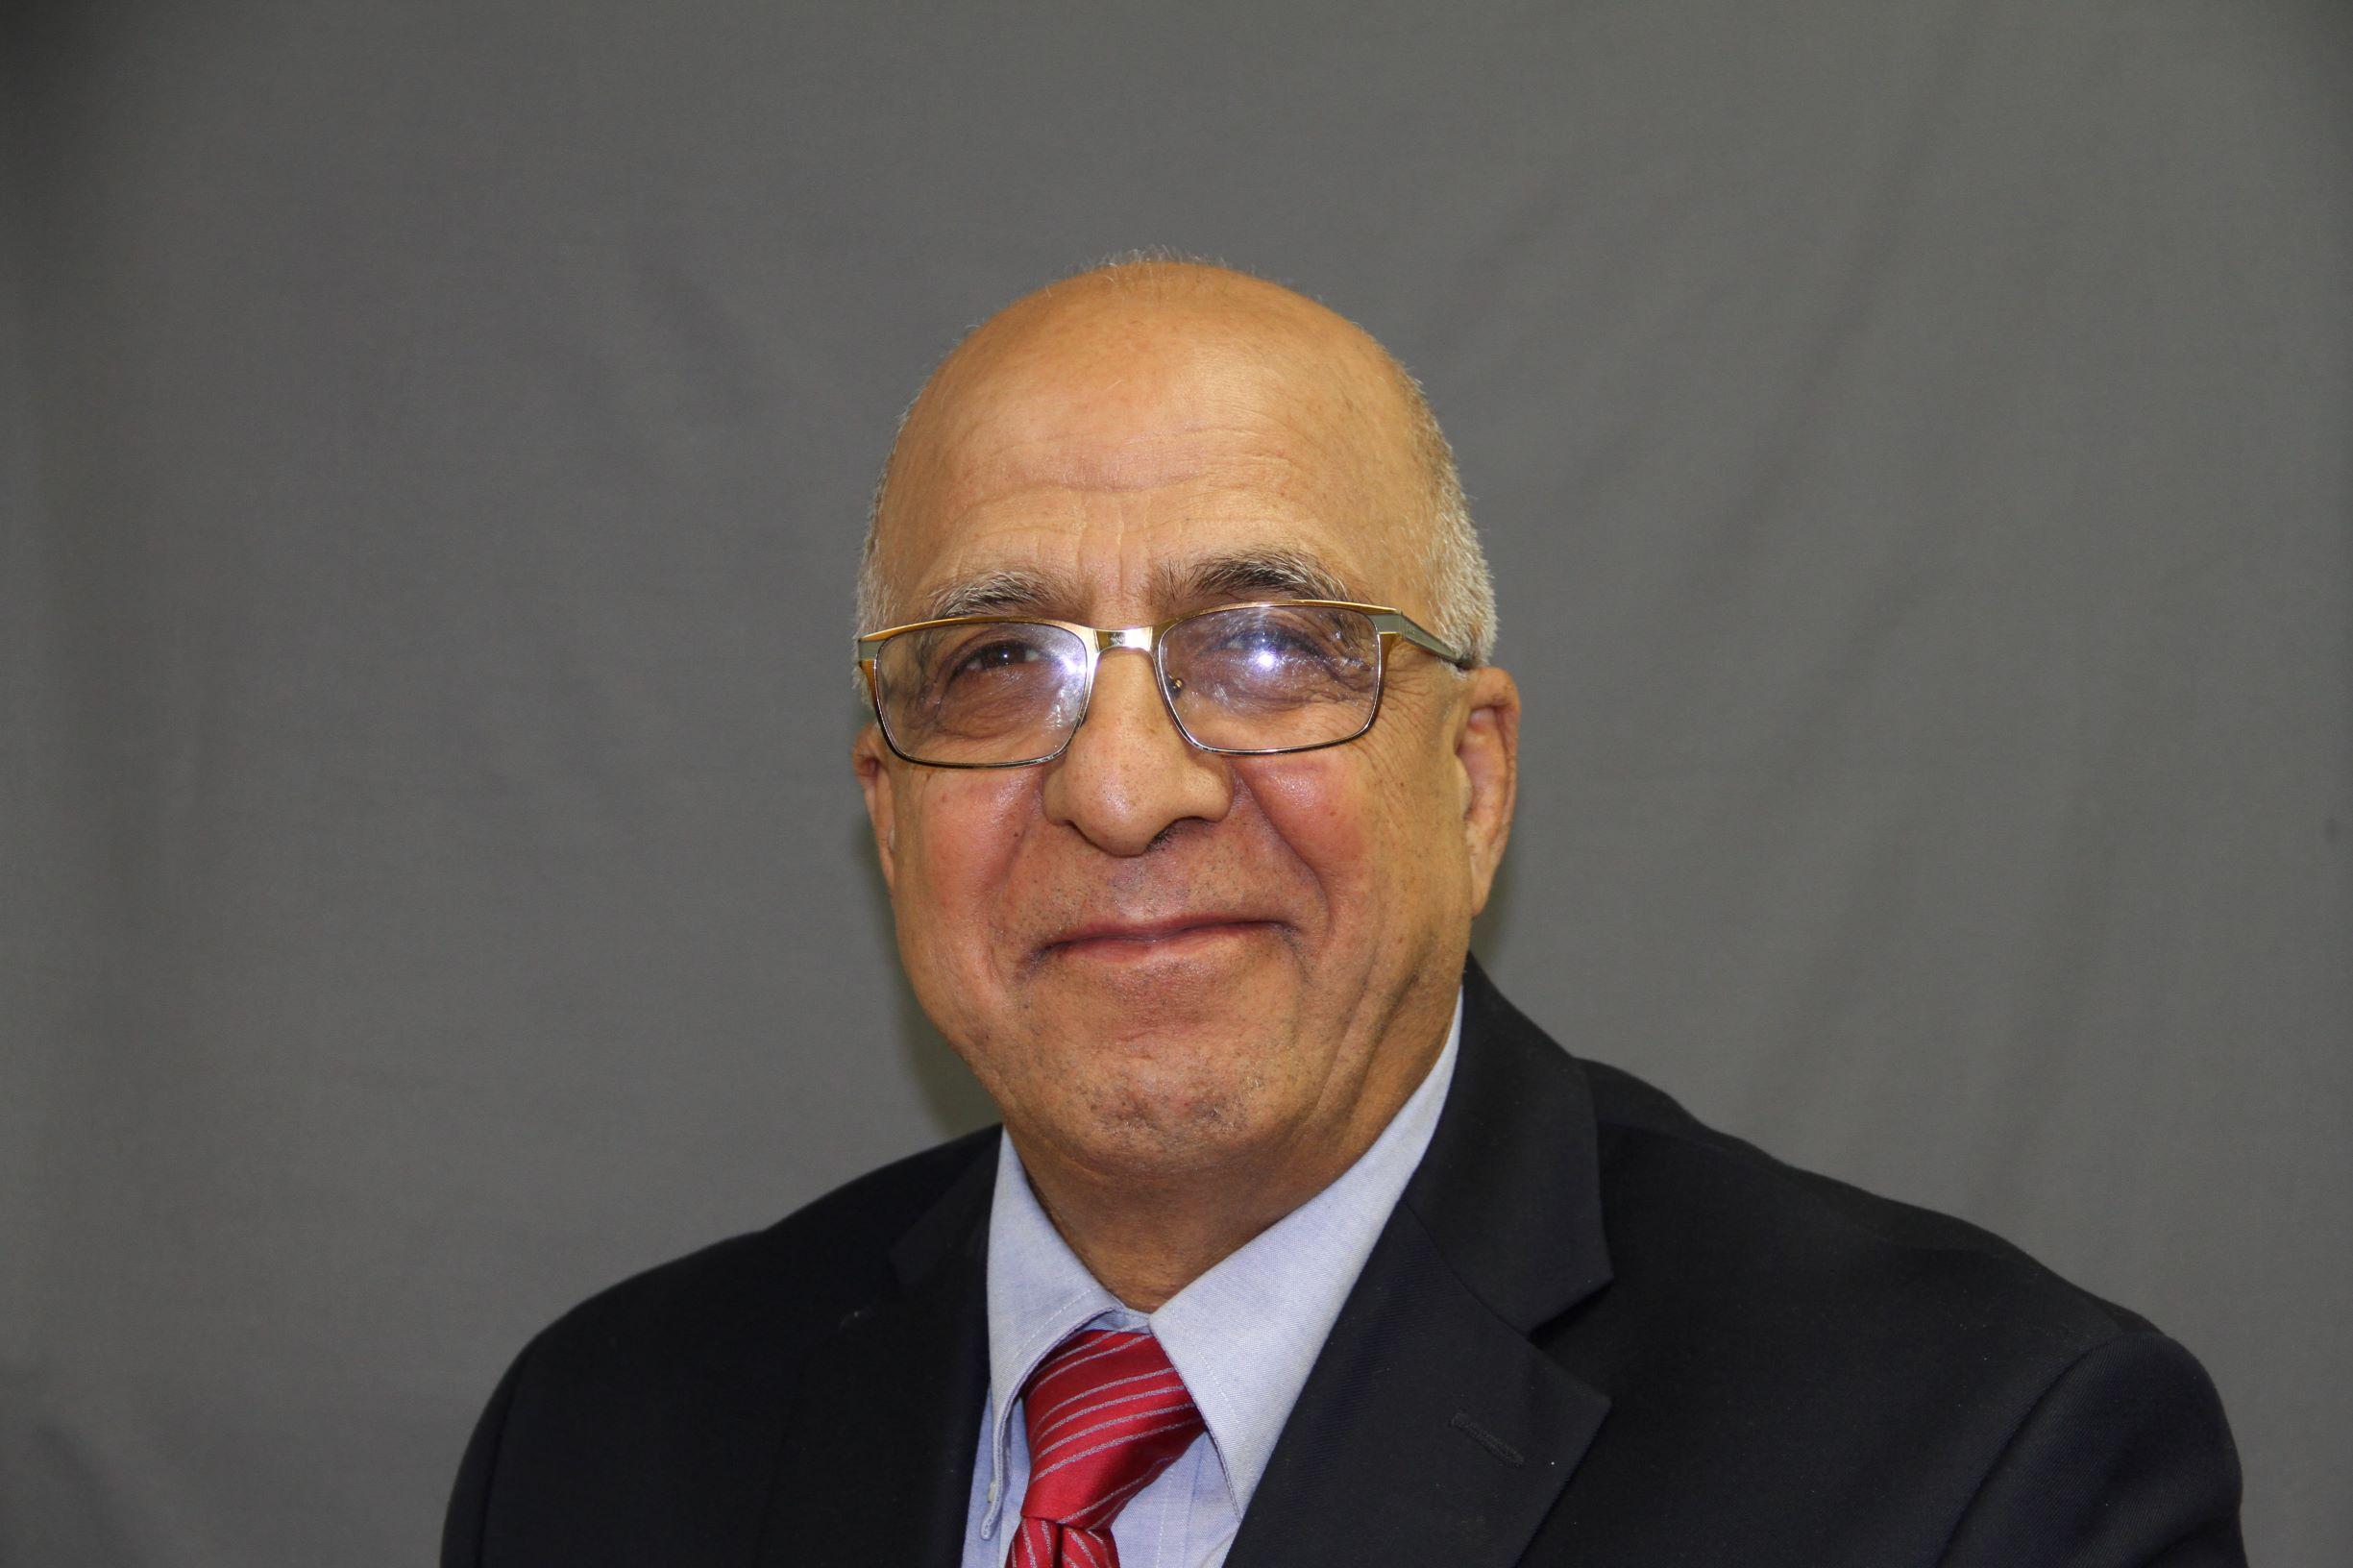 Hossein Eshghi